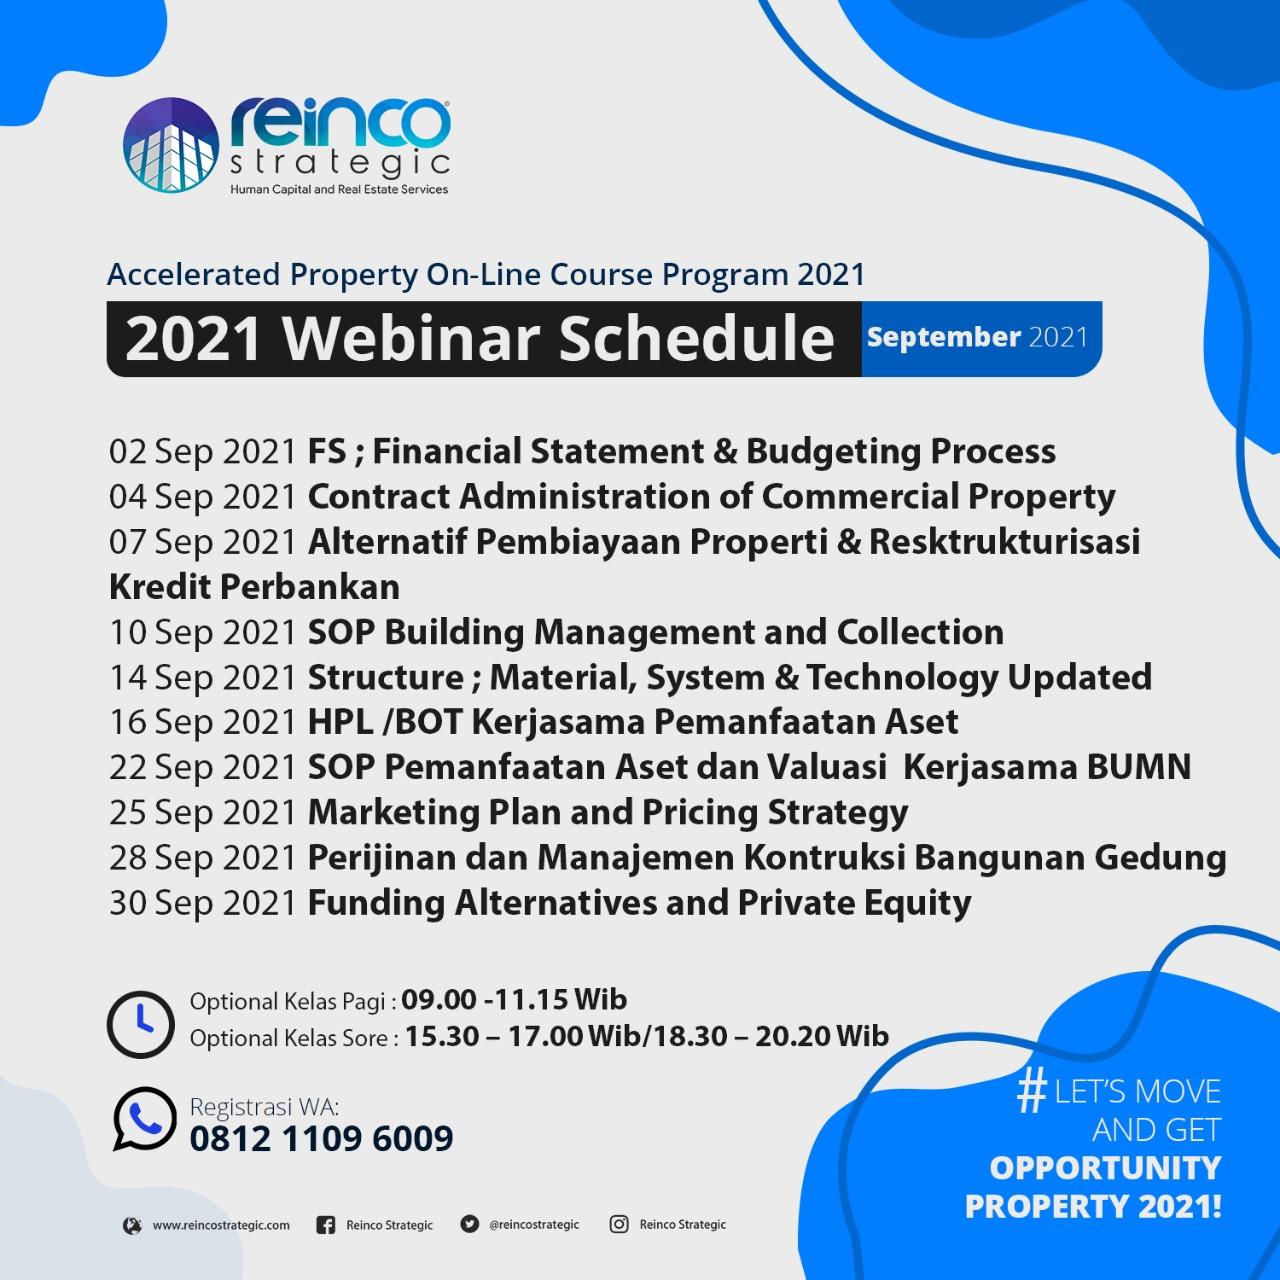 Webinar Schedule September 2021